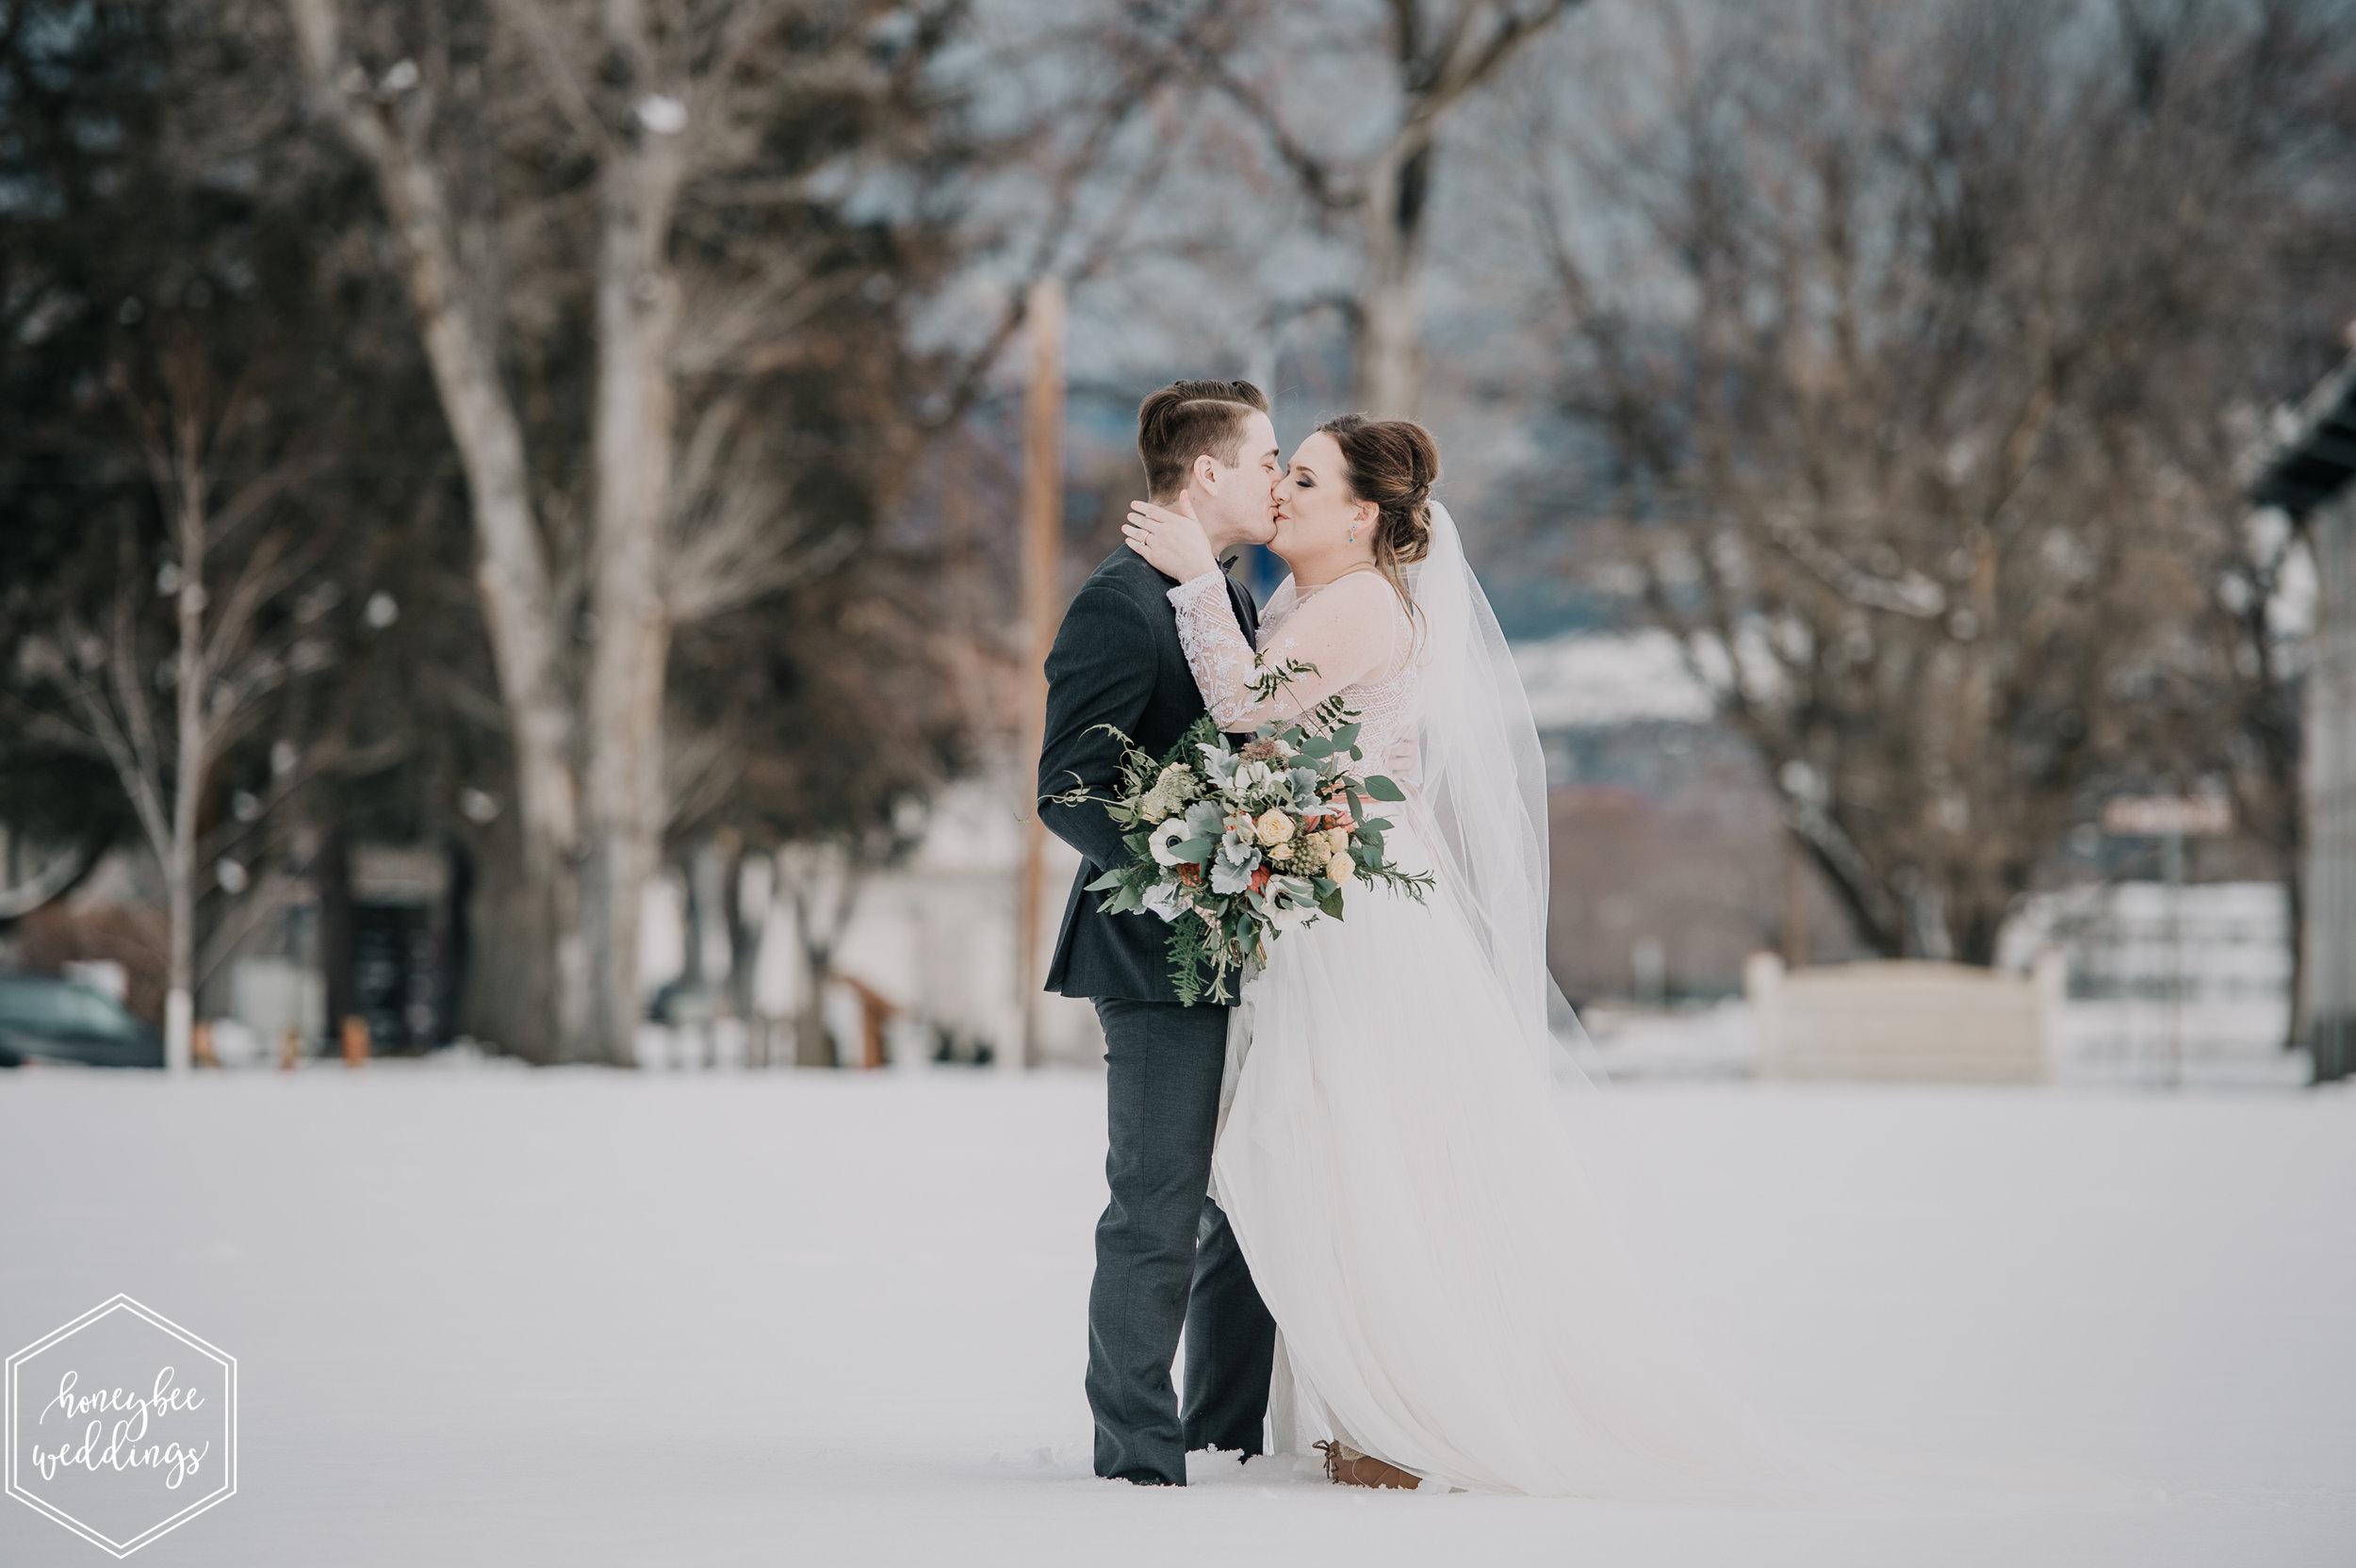 0105Montana Wedding Photographer_Montana winter wedding_Wedding at Fort Missoula_Meri & Carter_January 19, 2019-235.jpg